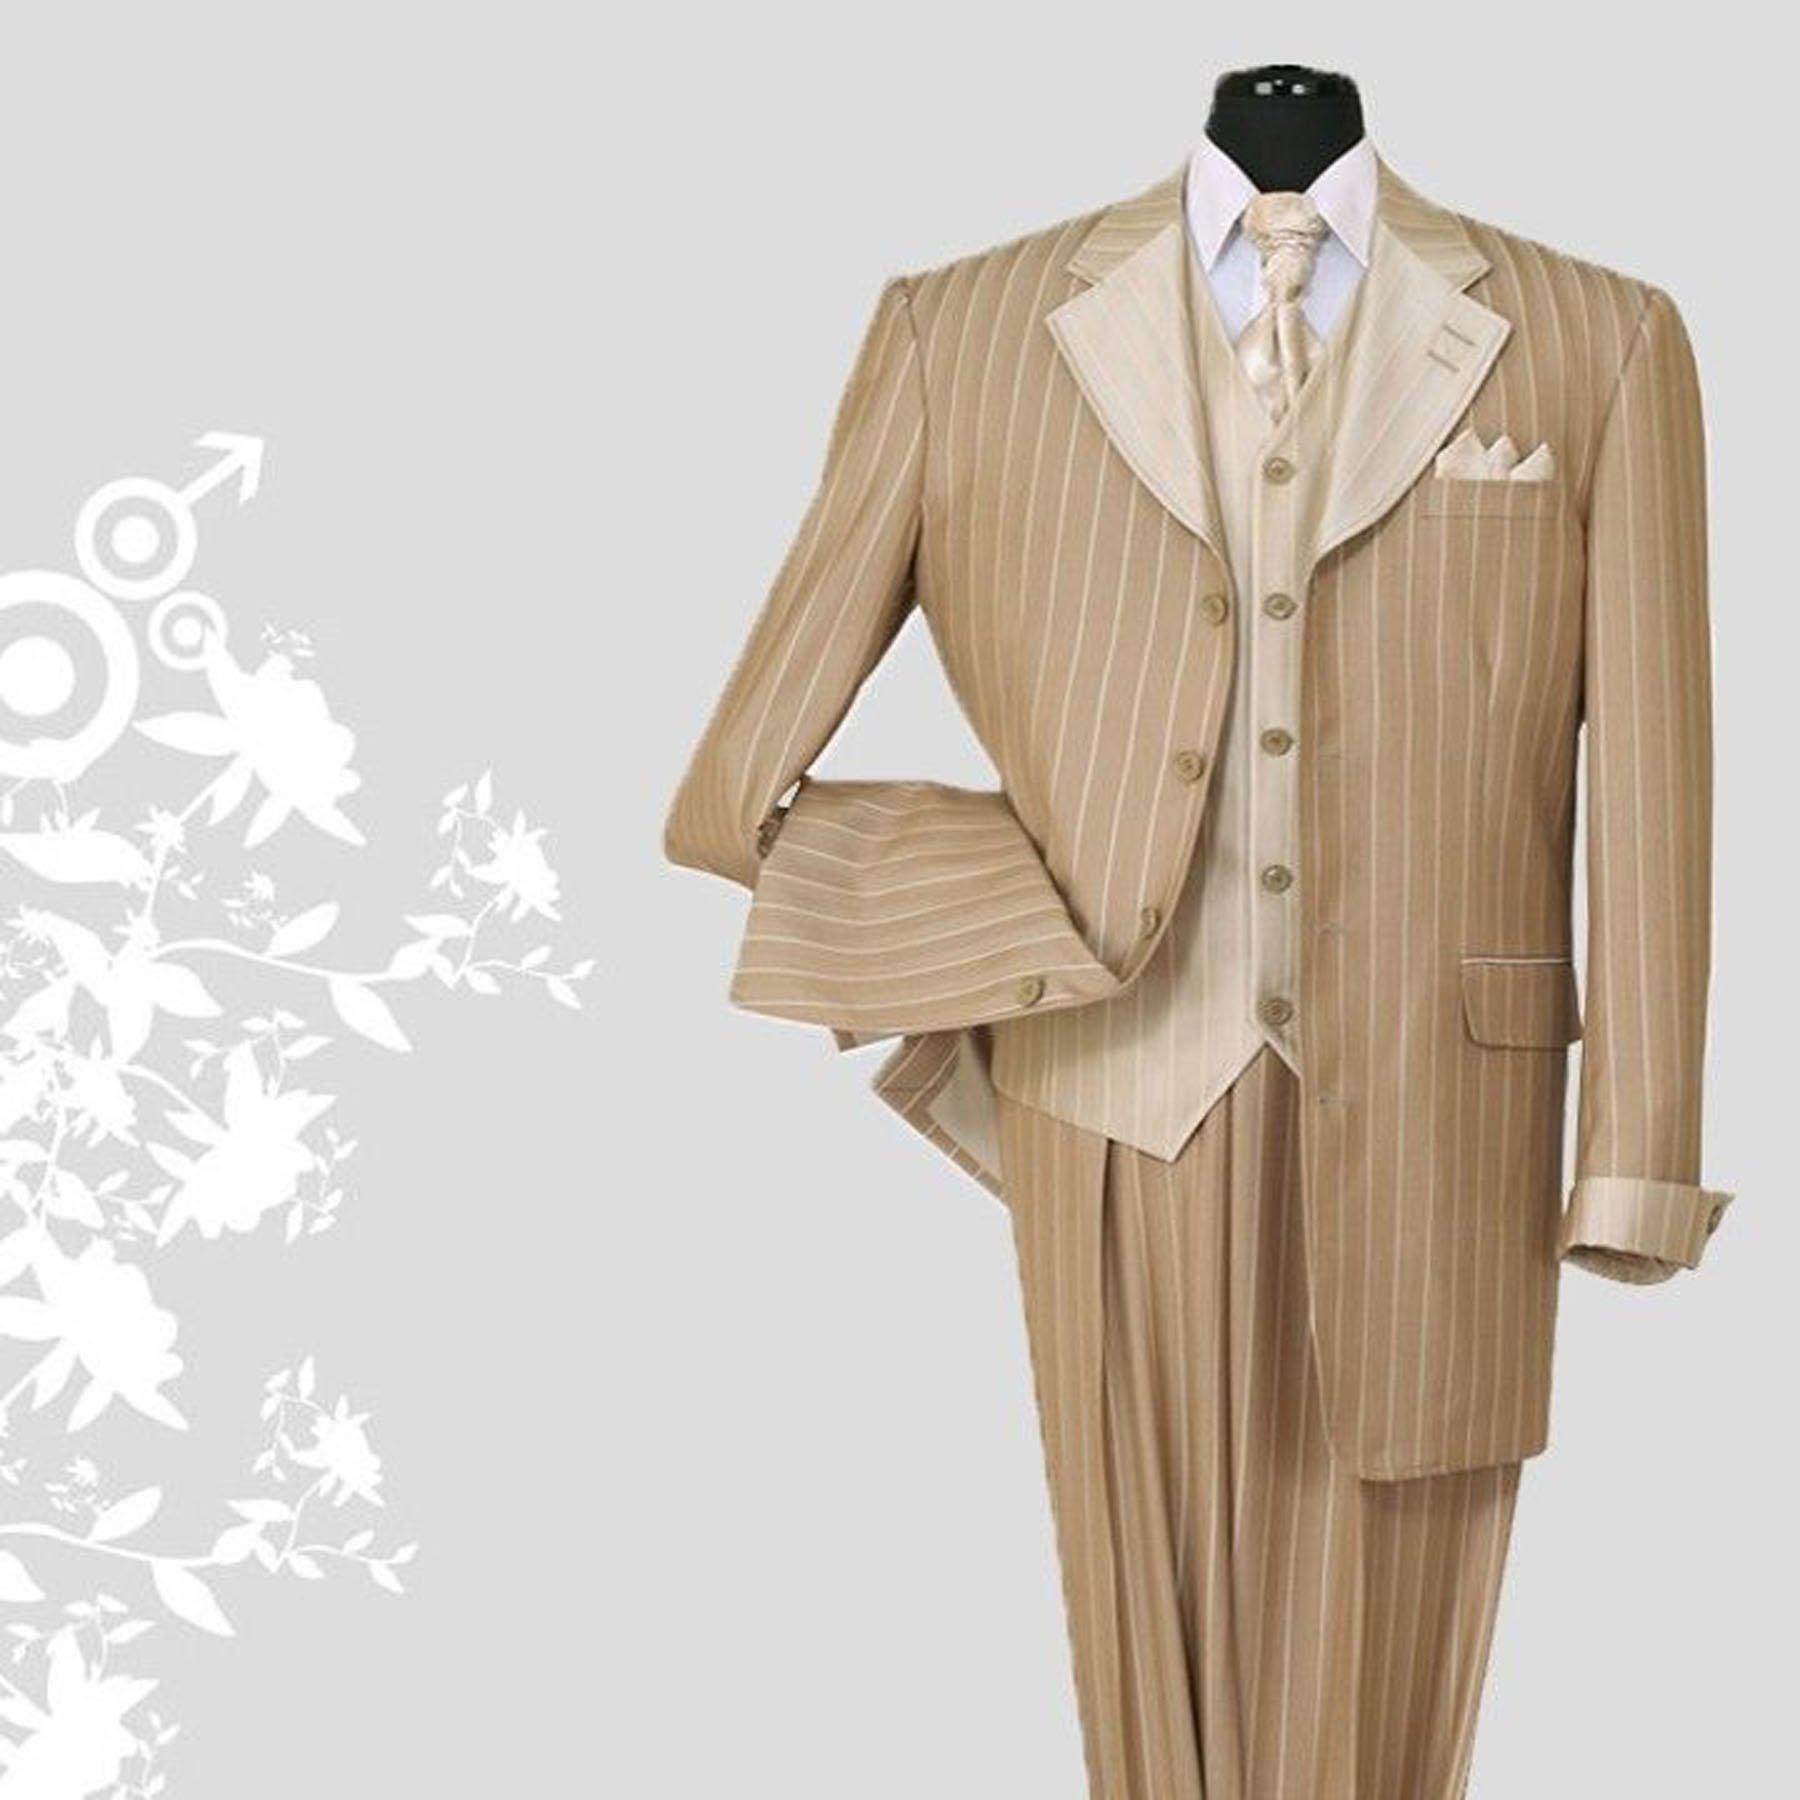 Milano Moda Pinestripe Fashion Suit with Contrast Collar, Cuffs & Vest 2911-Tan-50L